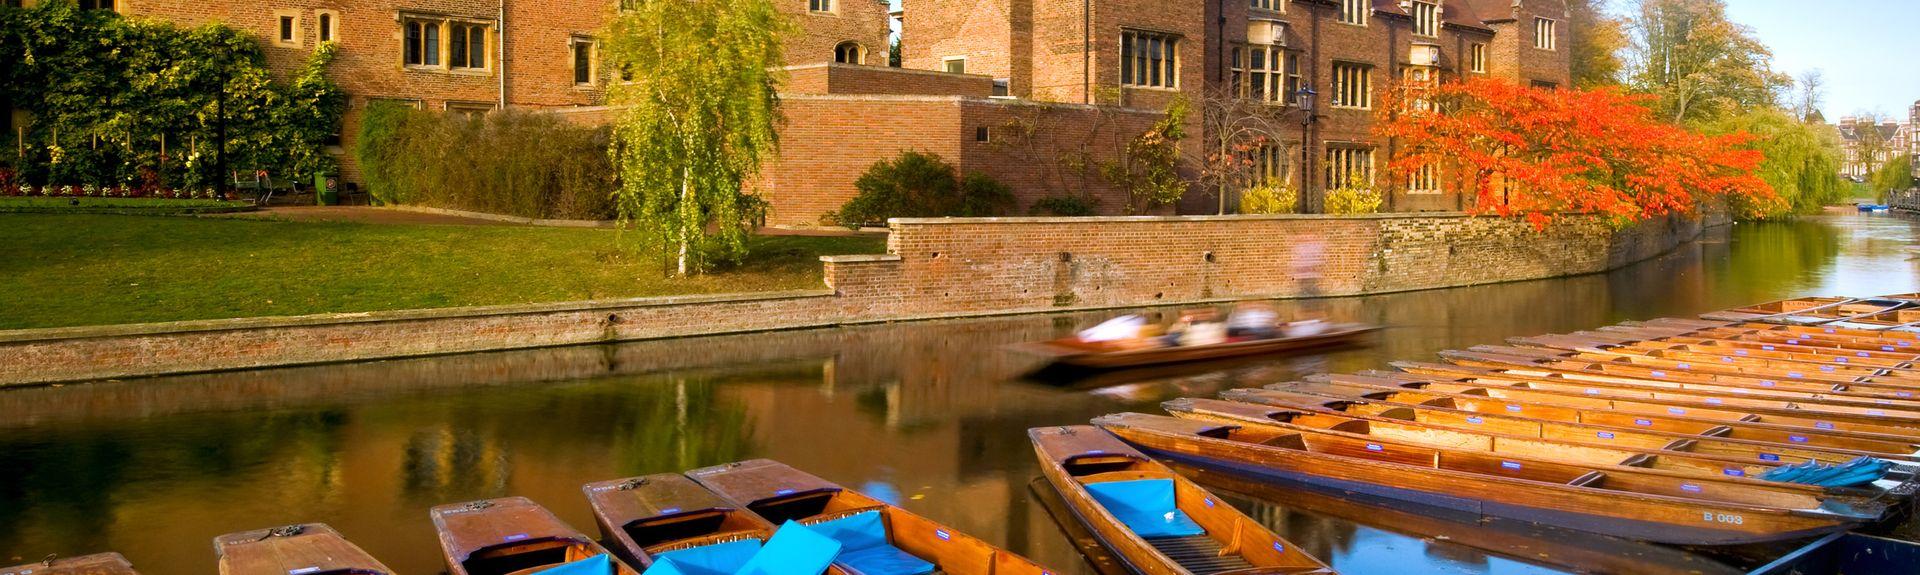 Cambridge, South Cambridgeshire District, Inglaterra, Reino Unido